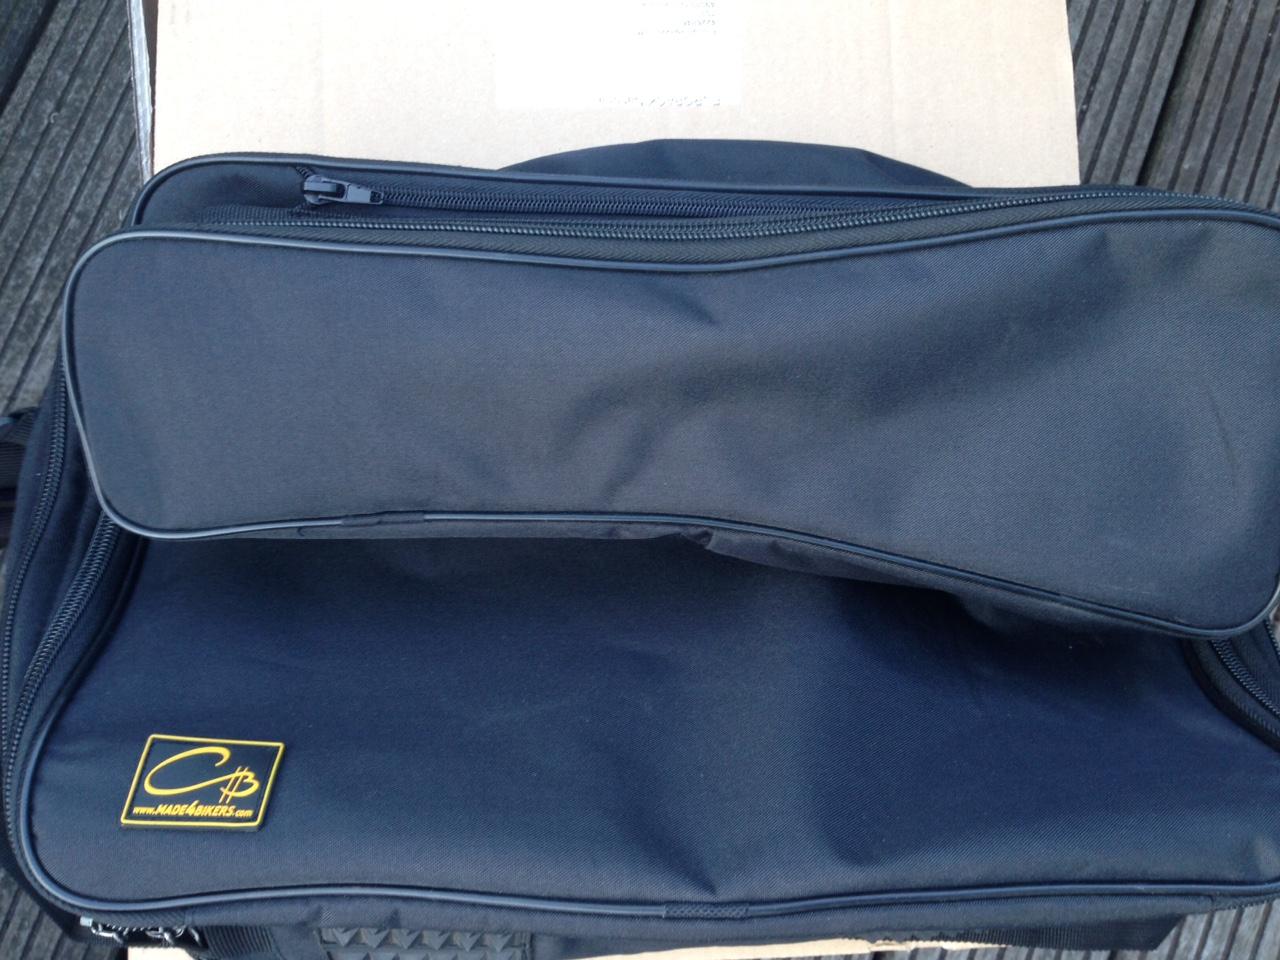 erledigt bmw r 1200 gs vario koffer innentaschen. Black Bedroom Furniture Sets. Home Design Ideas